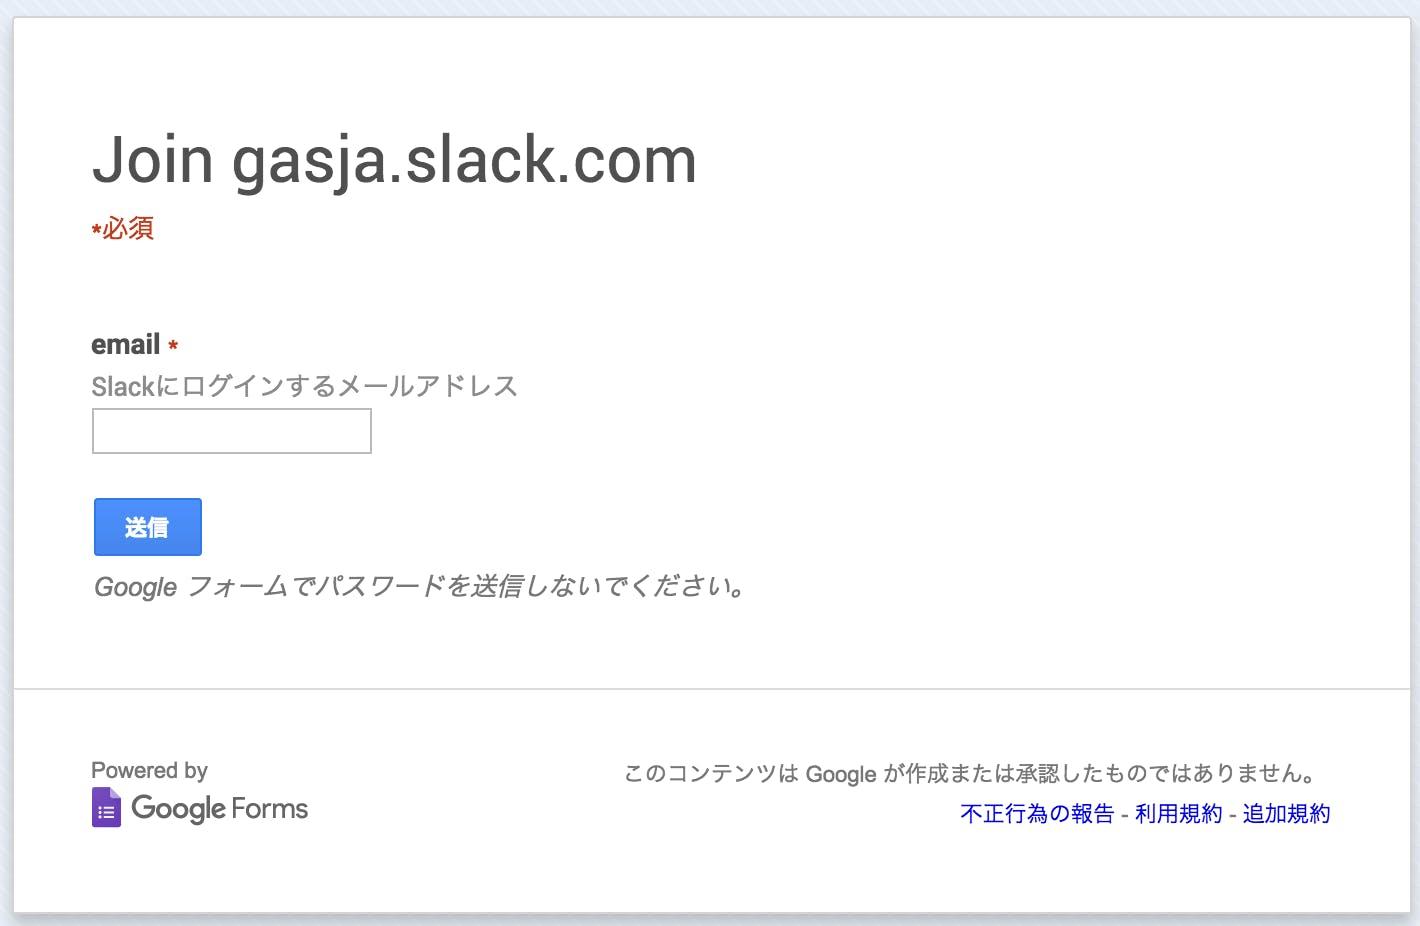 Join_gasja_slack_com.png